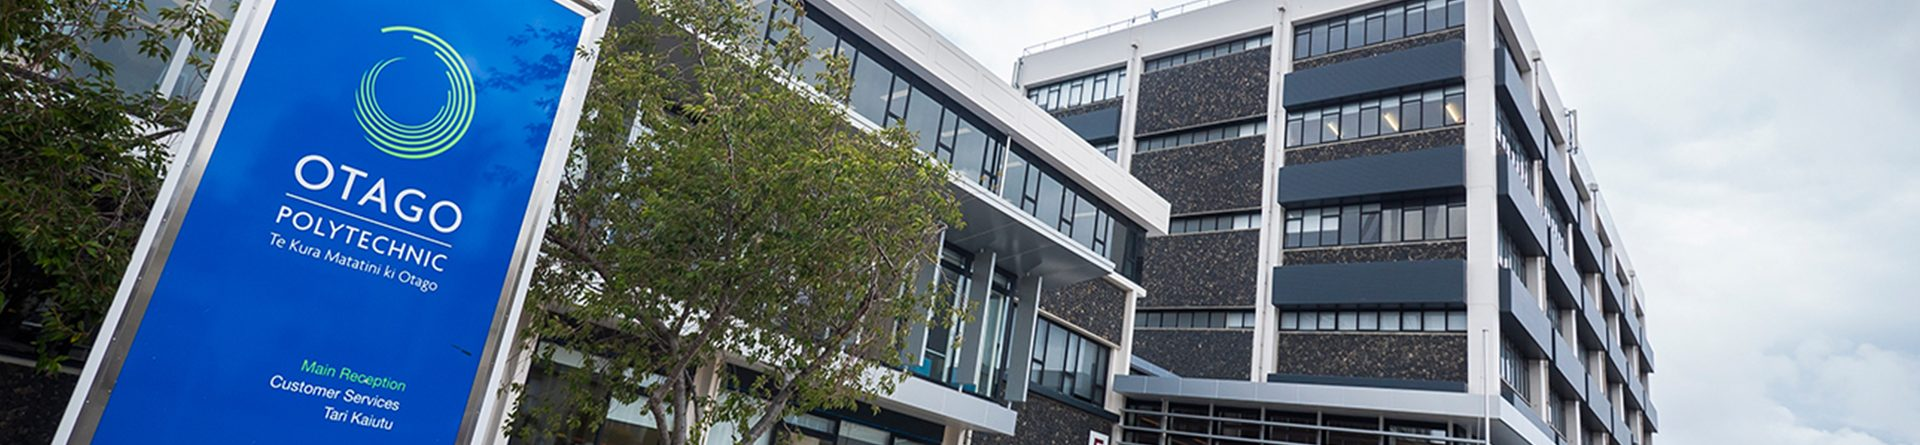 Otago Polytechnic. Covid-19 Relief Scholarships